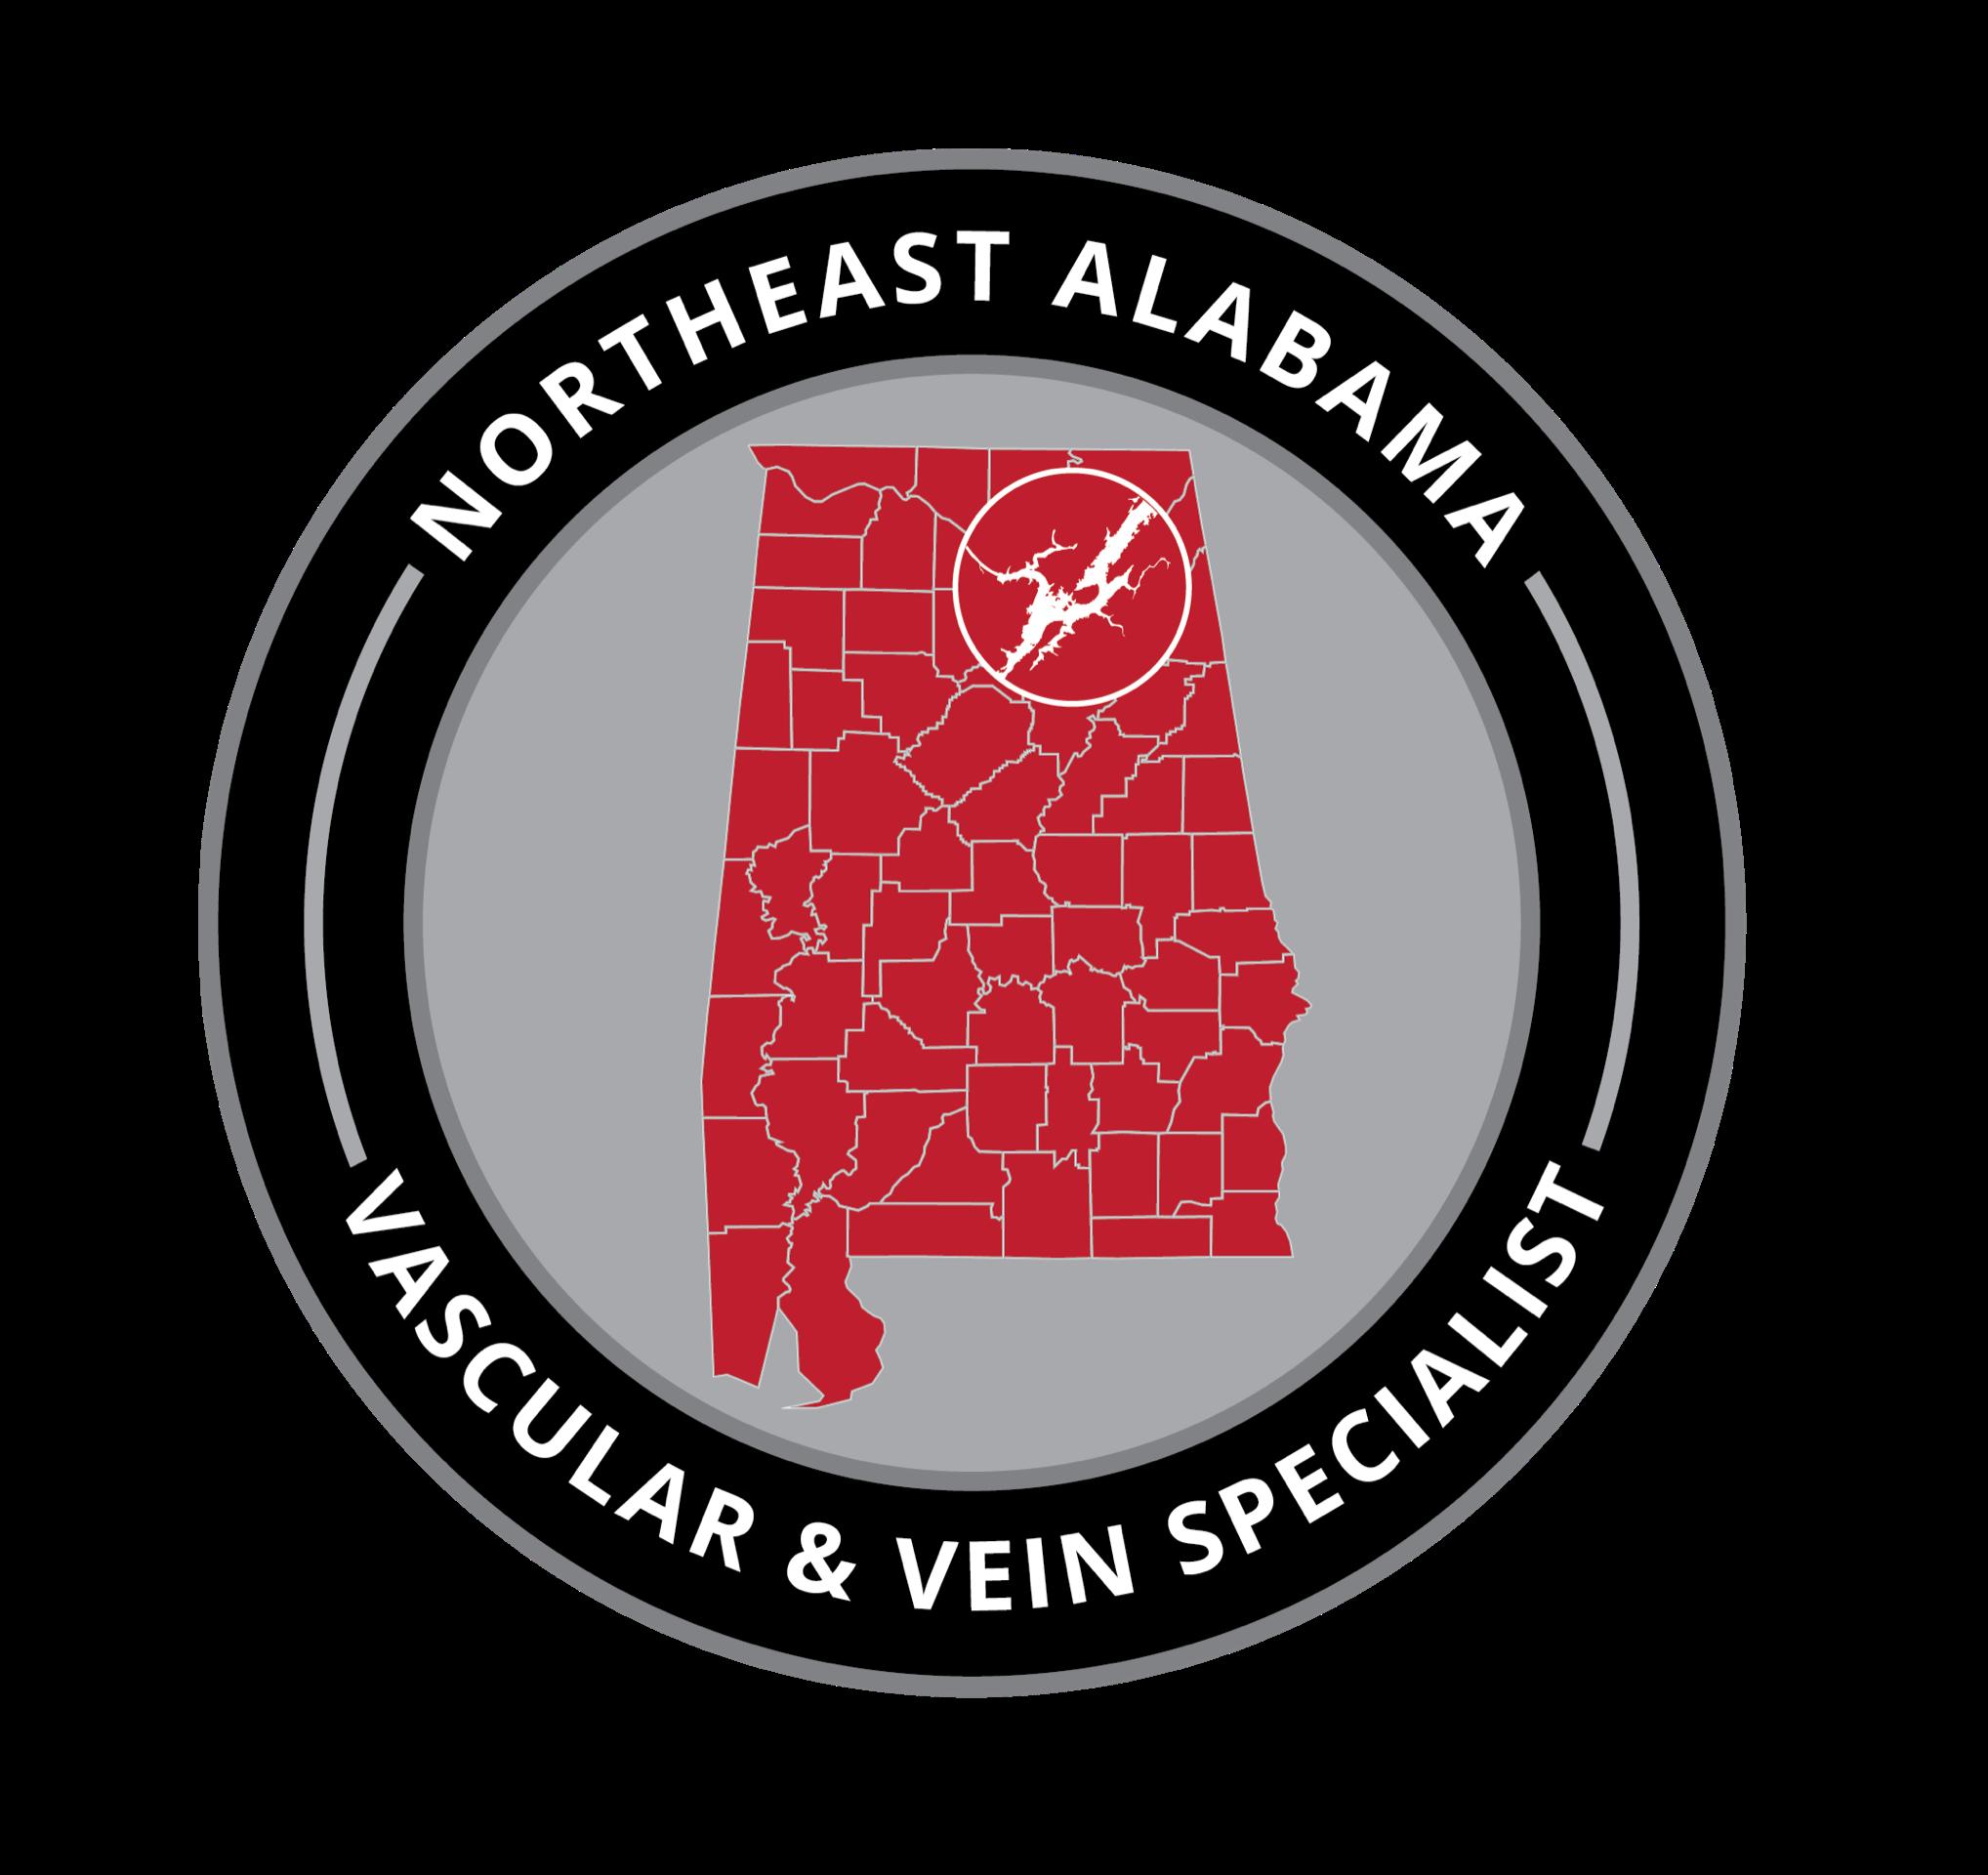 Northeast Alabama Vascular and Vein Specialist